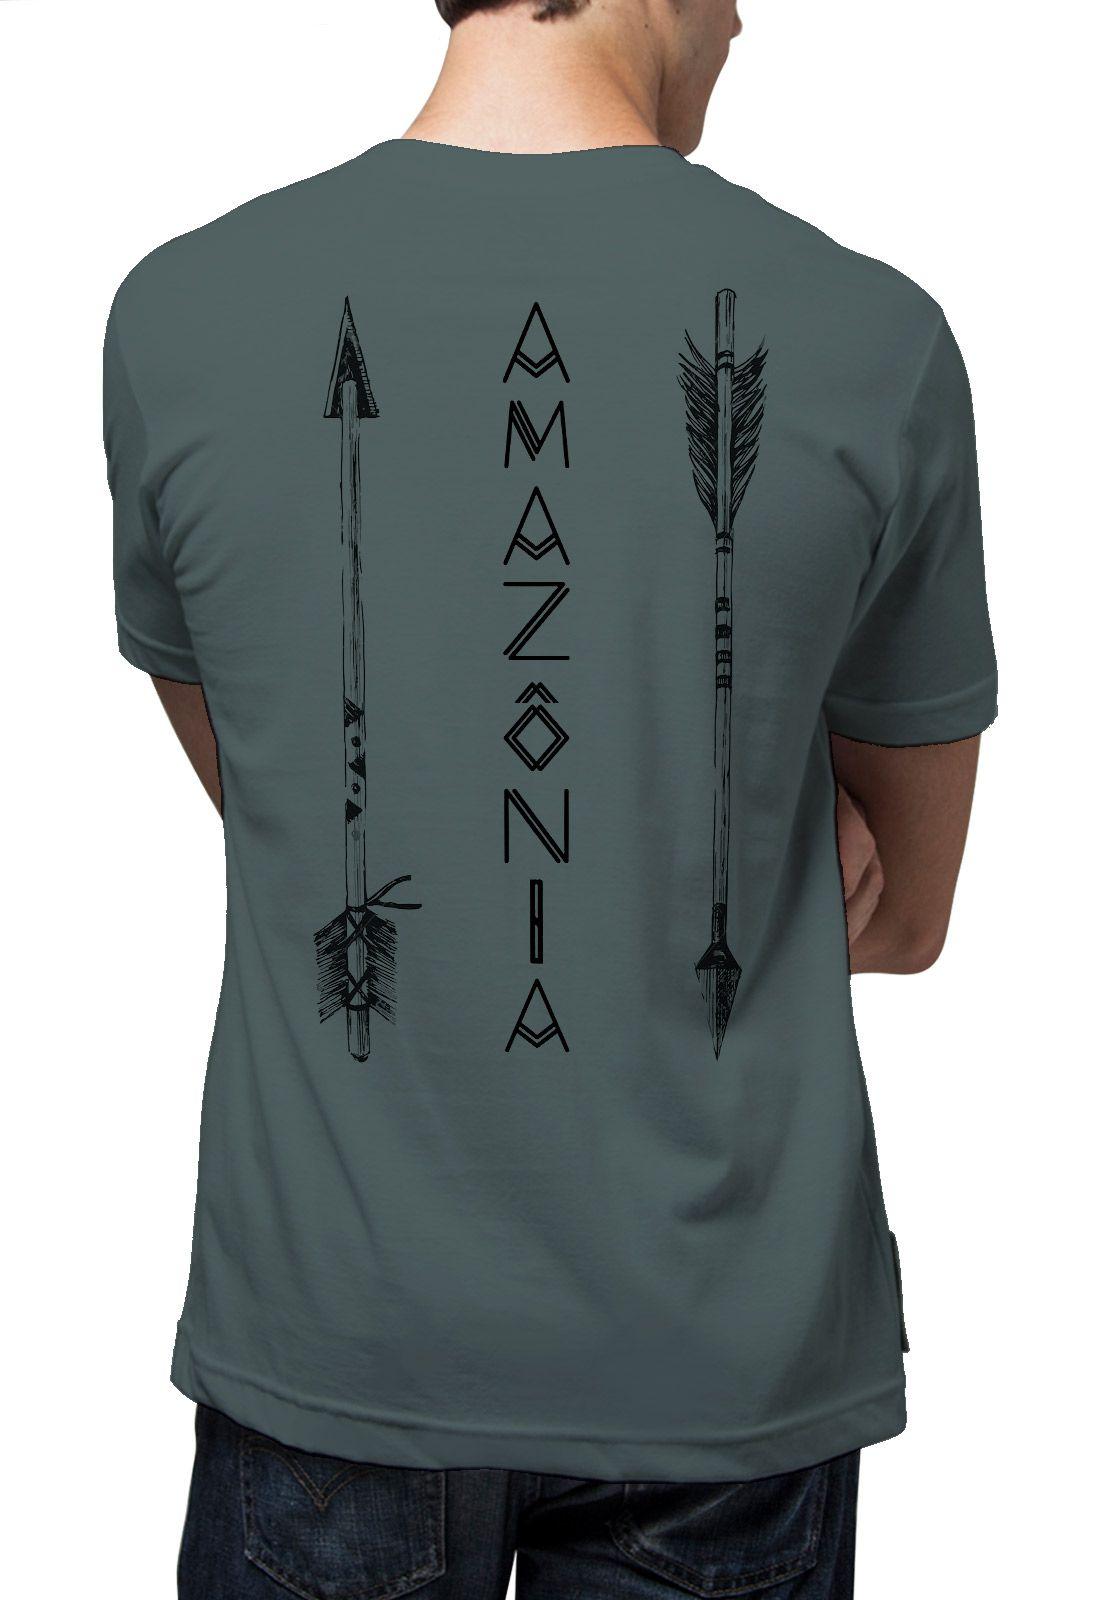 Camiseta Amazônia Flechas - Cinza